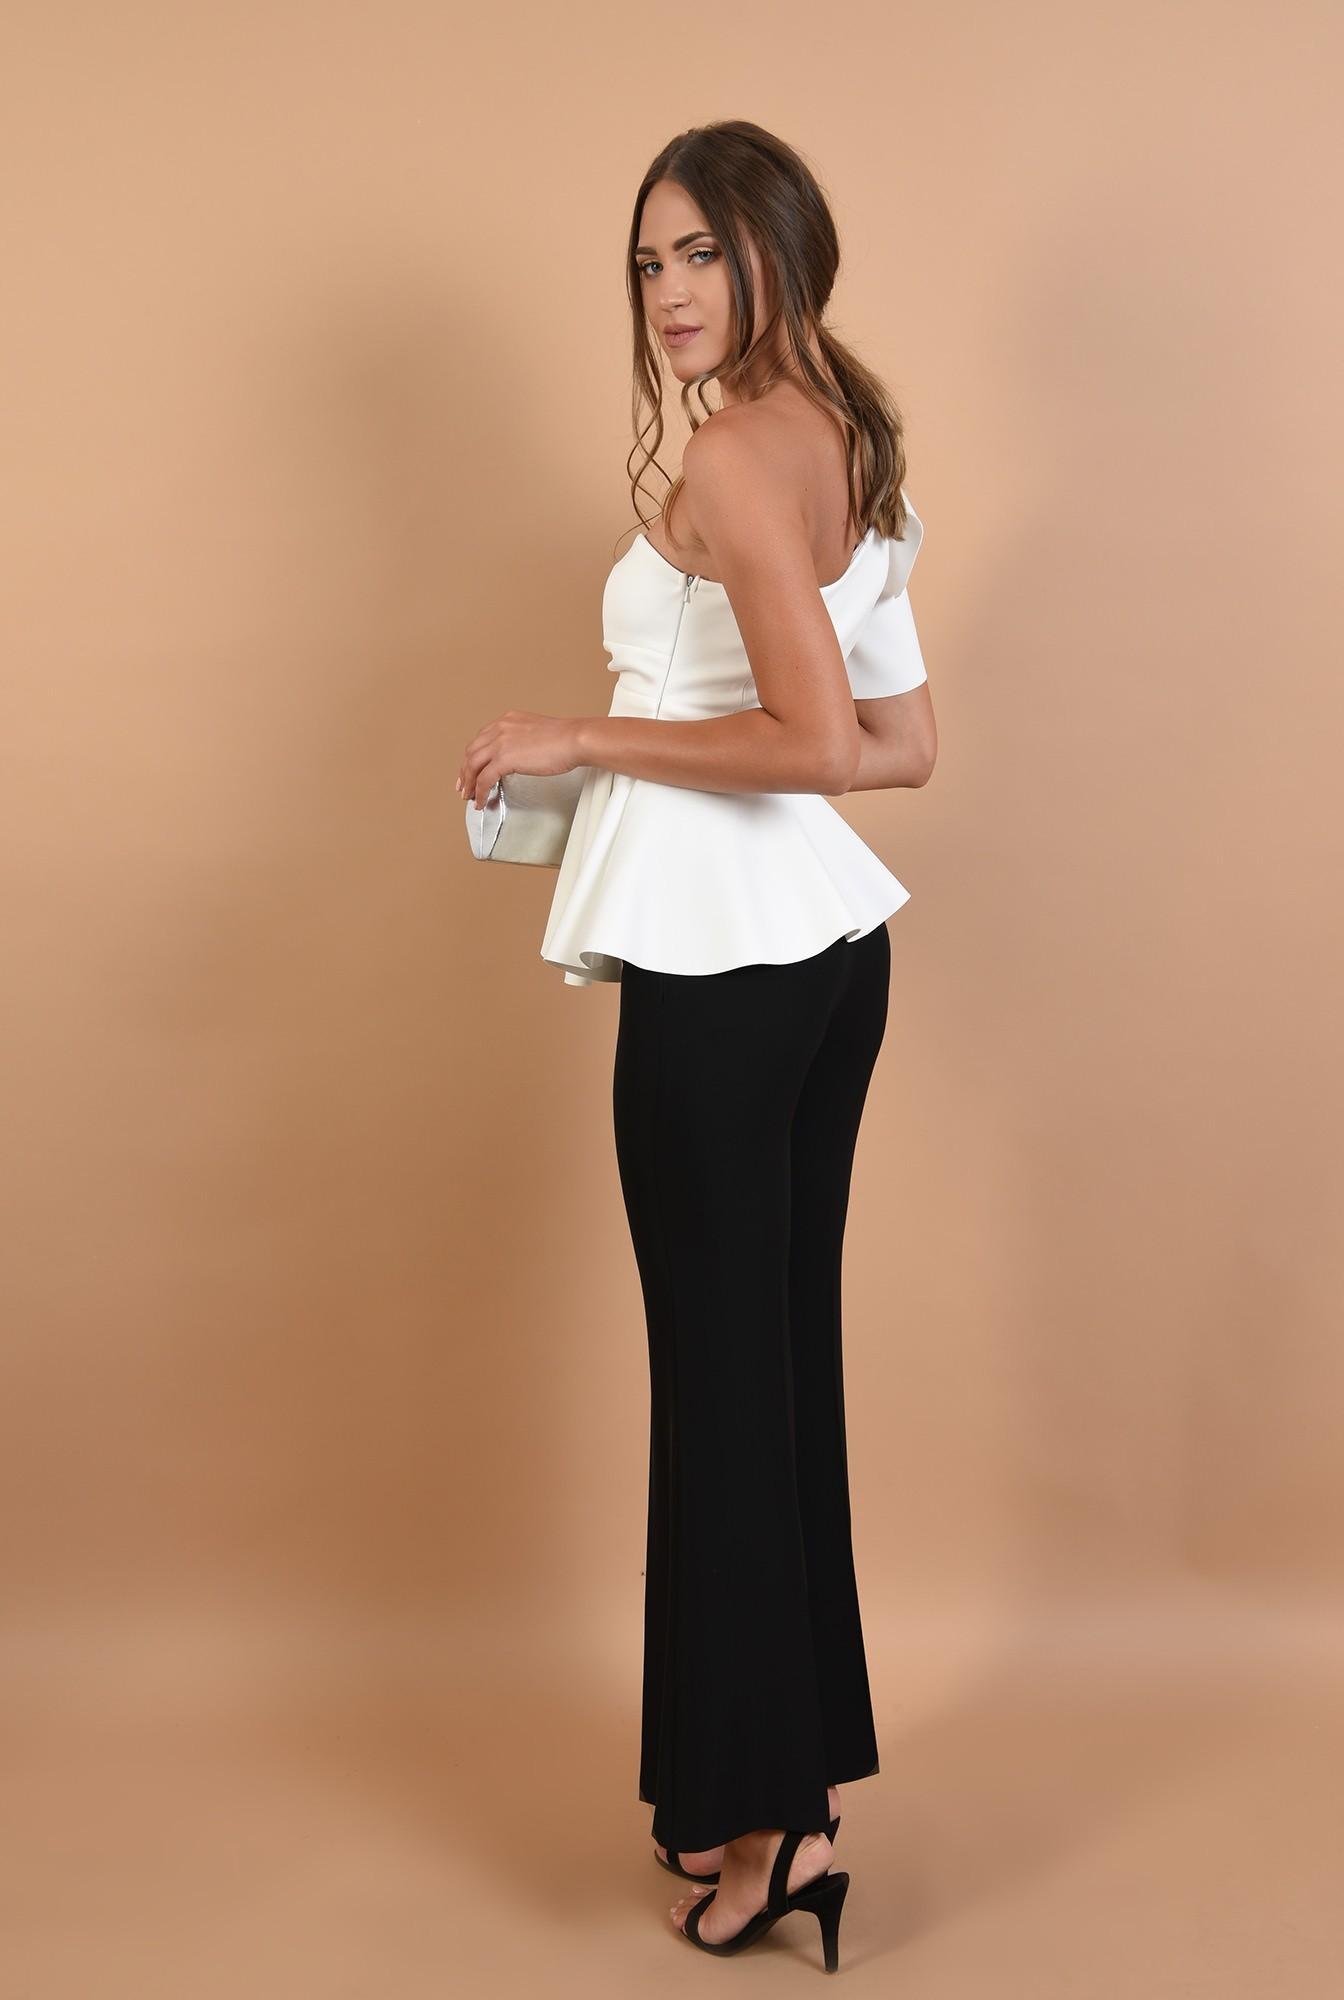 1 - 360 - pantaloni de ocazie, negri, lungi, croi evazat, la dunga